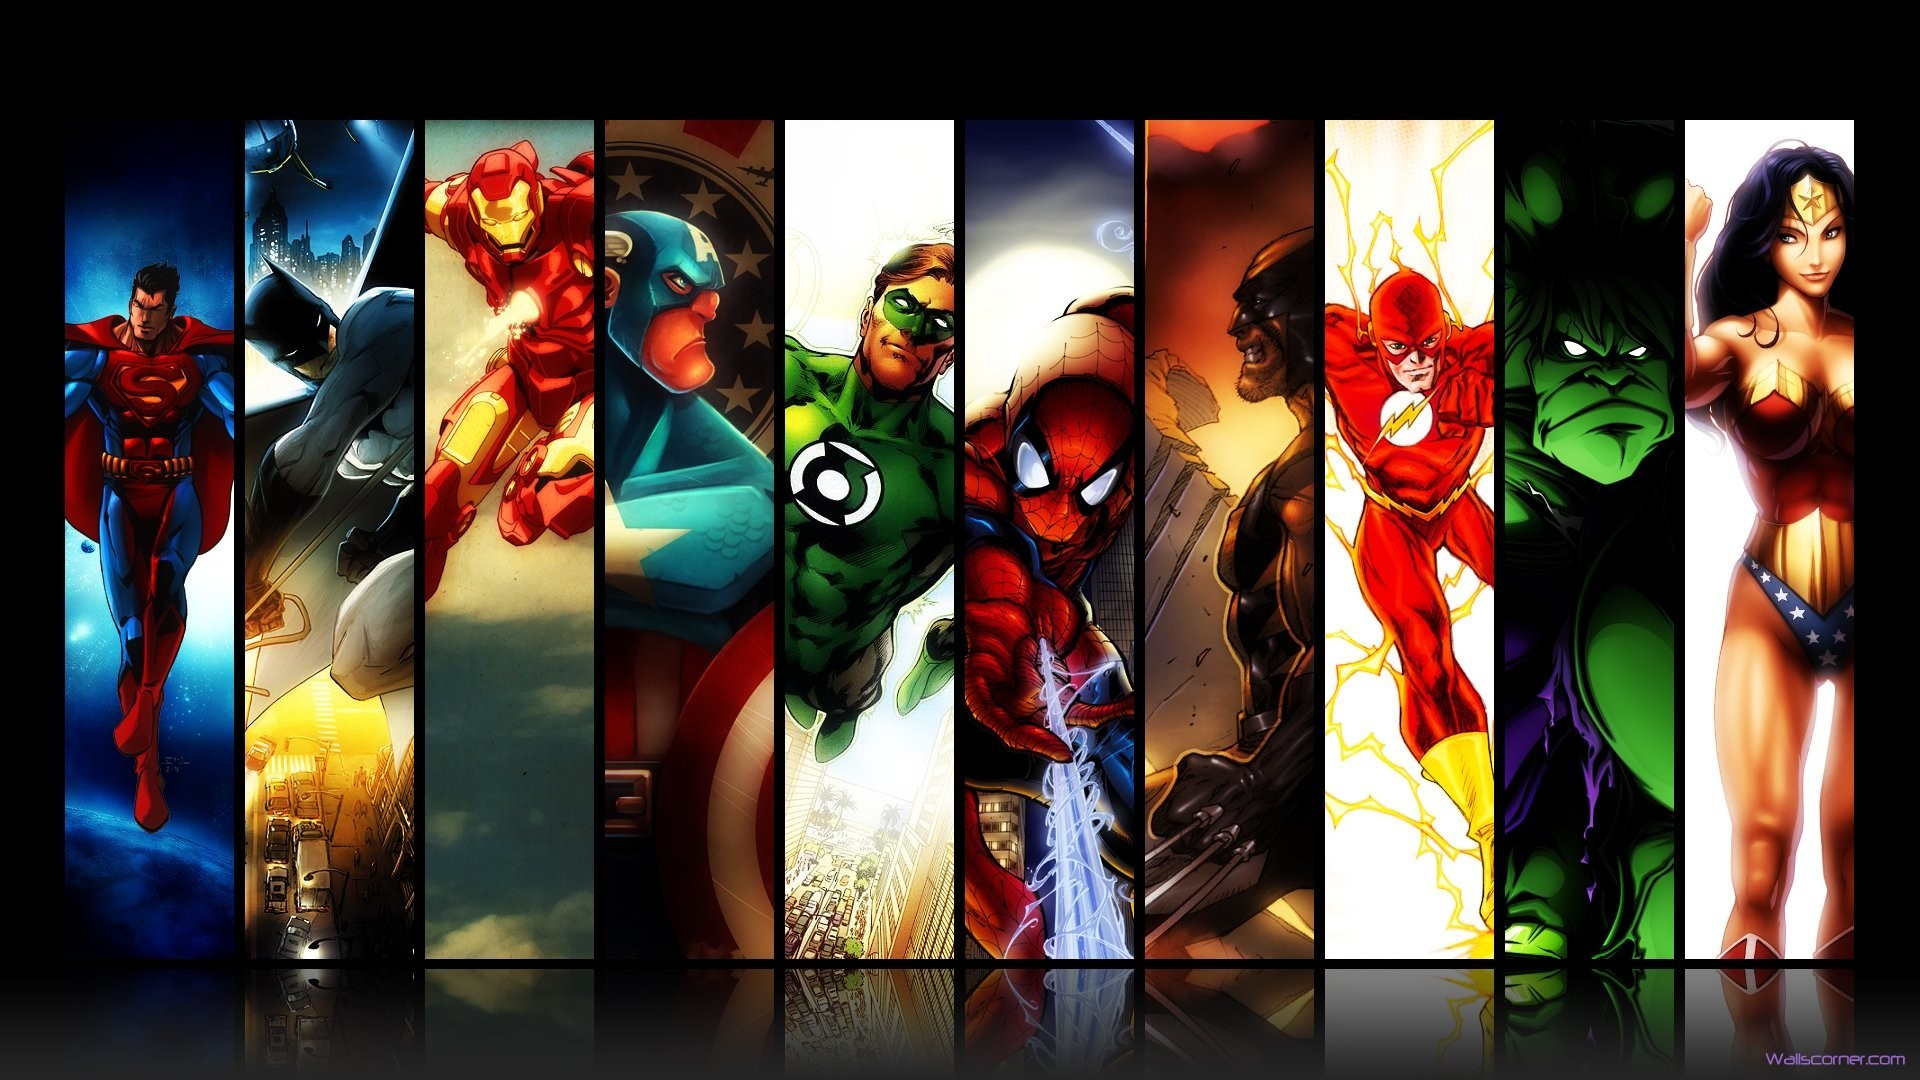 General 1920x1080 Marvel Comics DC Comics Batman Iron Man Spider-Man Green Lantern Captain America Wolverine The Flash Hulk Wonder Woman Marvel Super Heroes collage